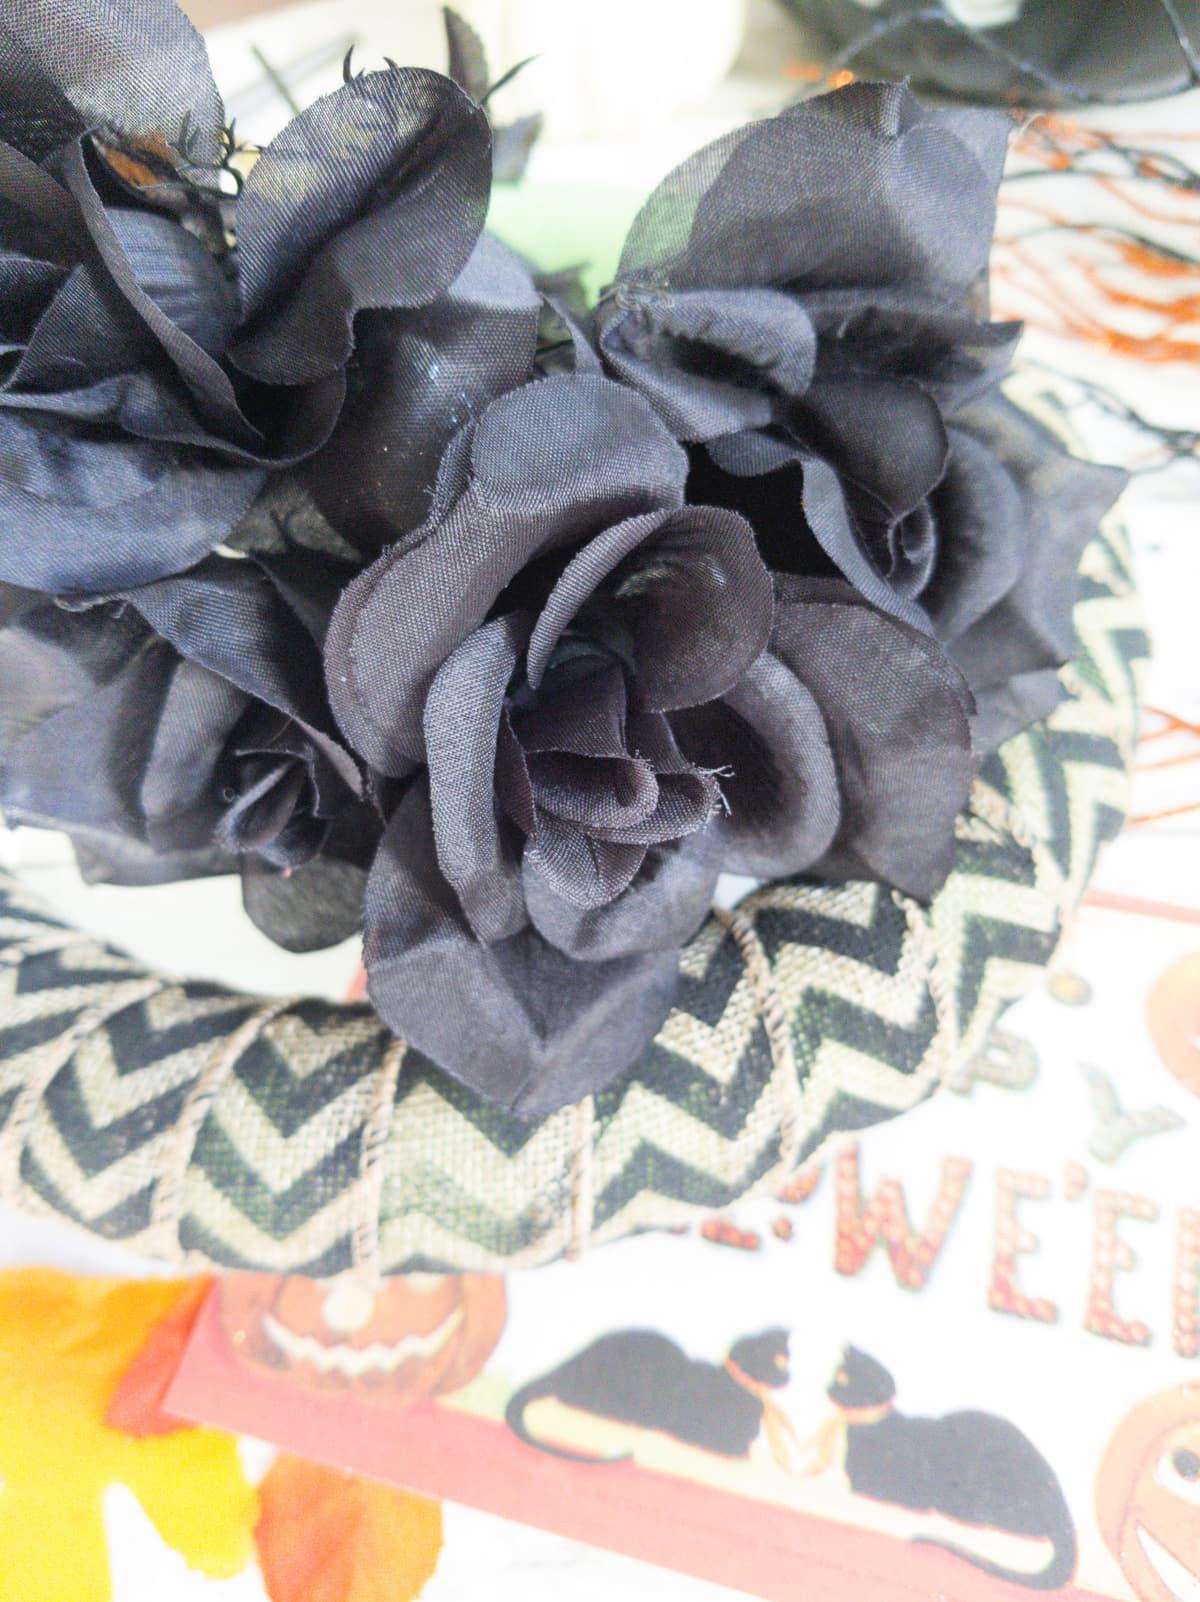 Black silk flowers on wreath